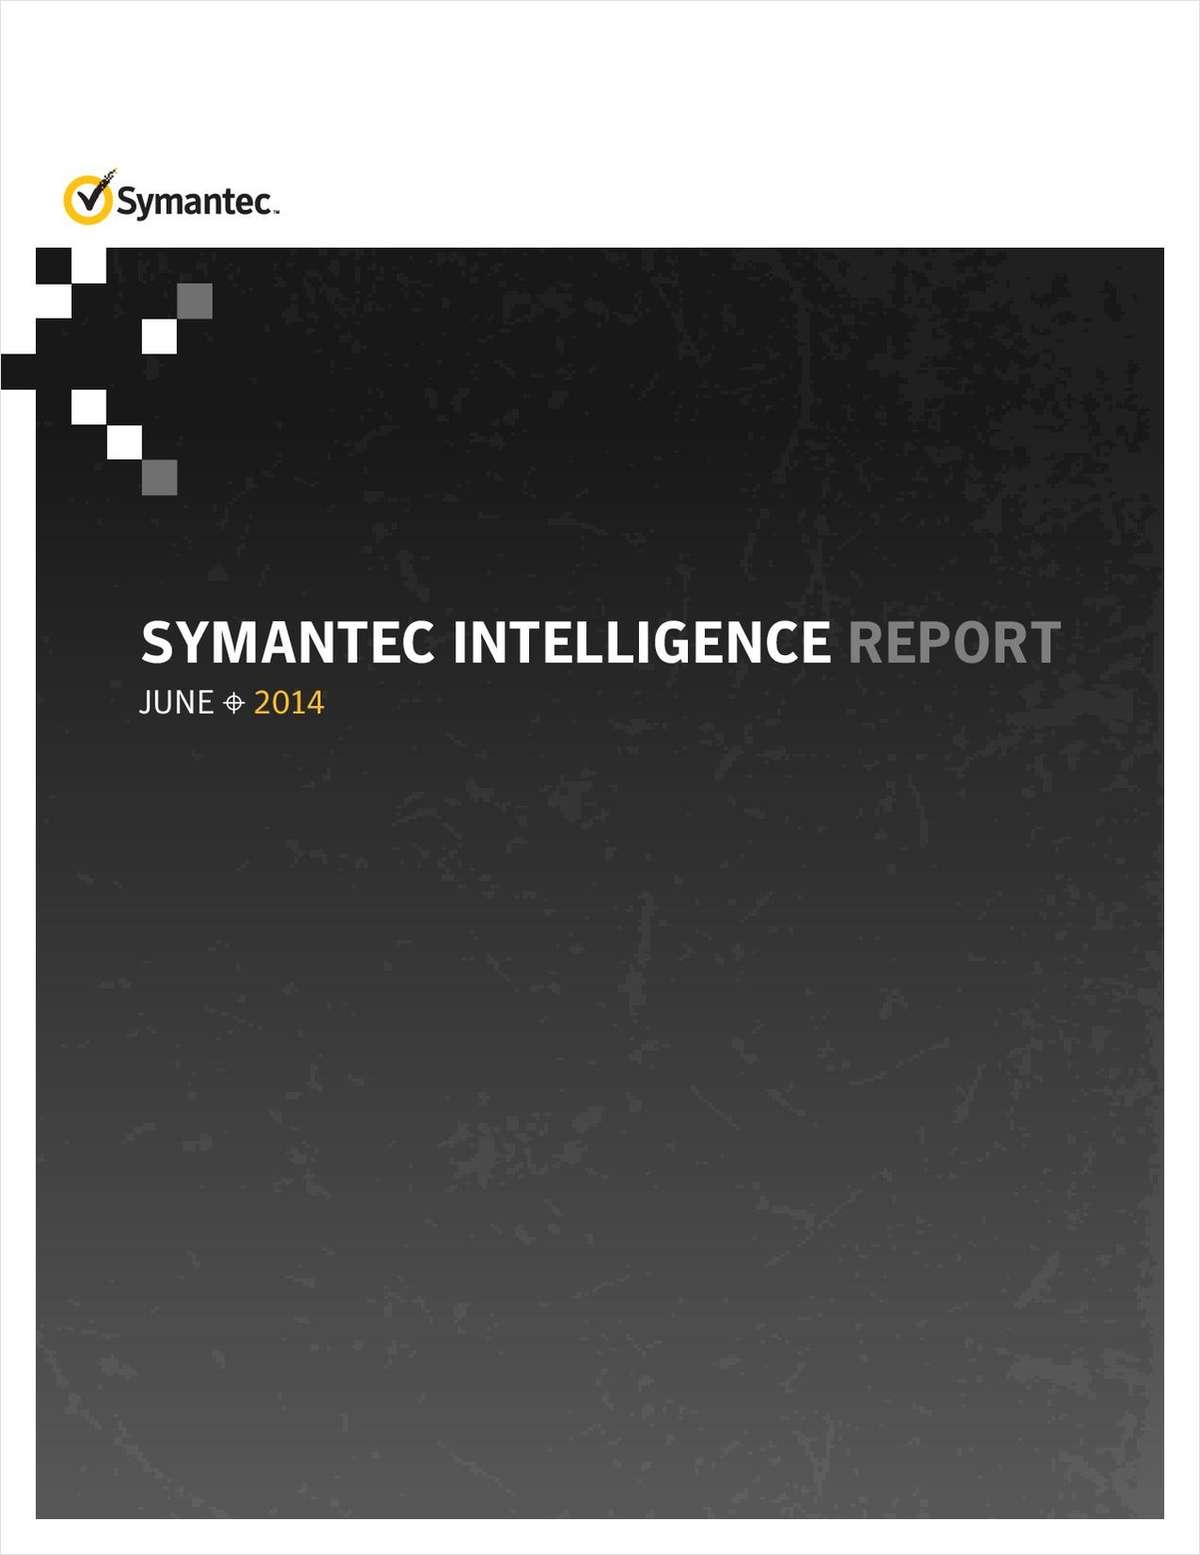 Symantec Intelligence Report June 2014